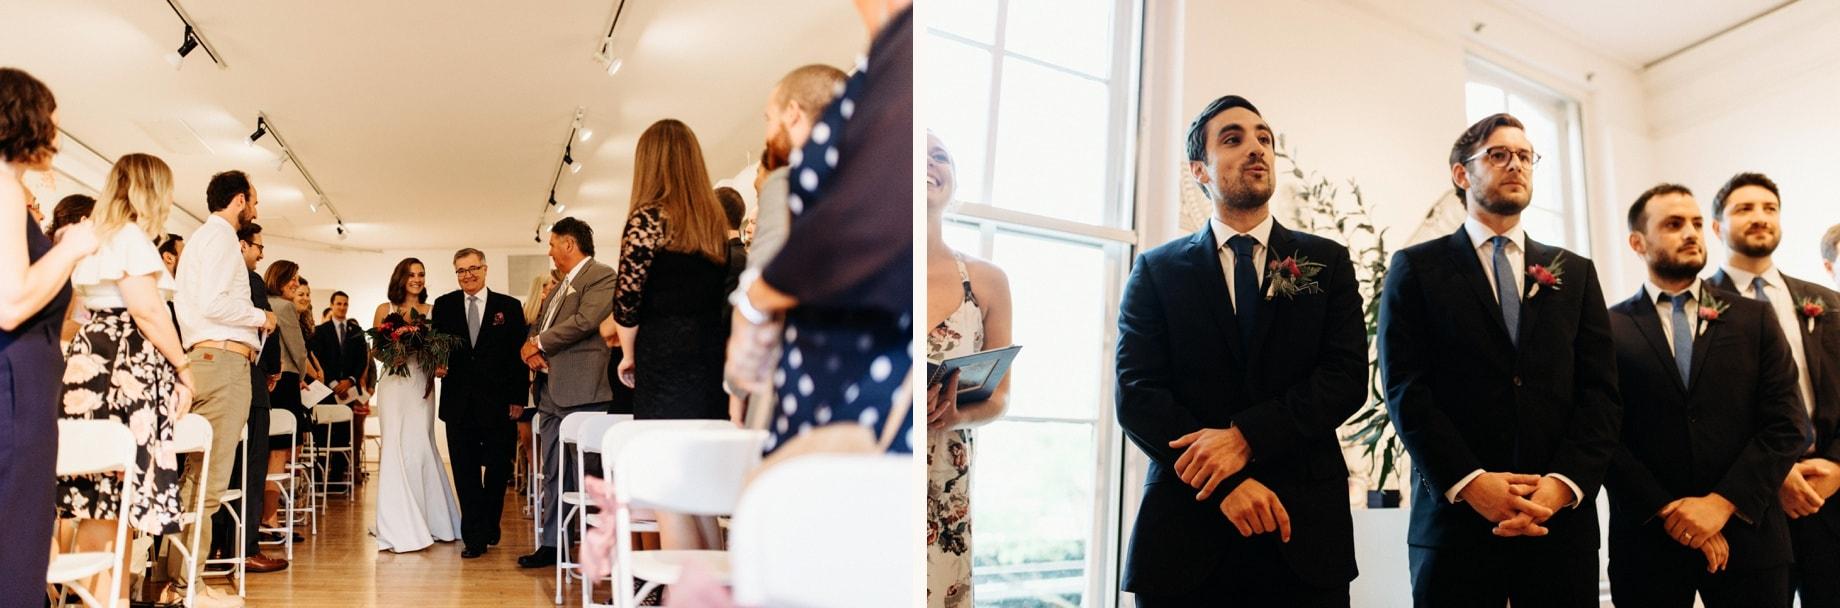 modern art gallery wedding ceremony